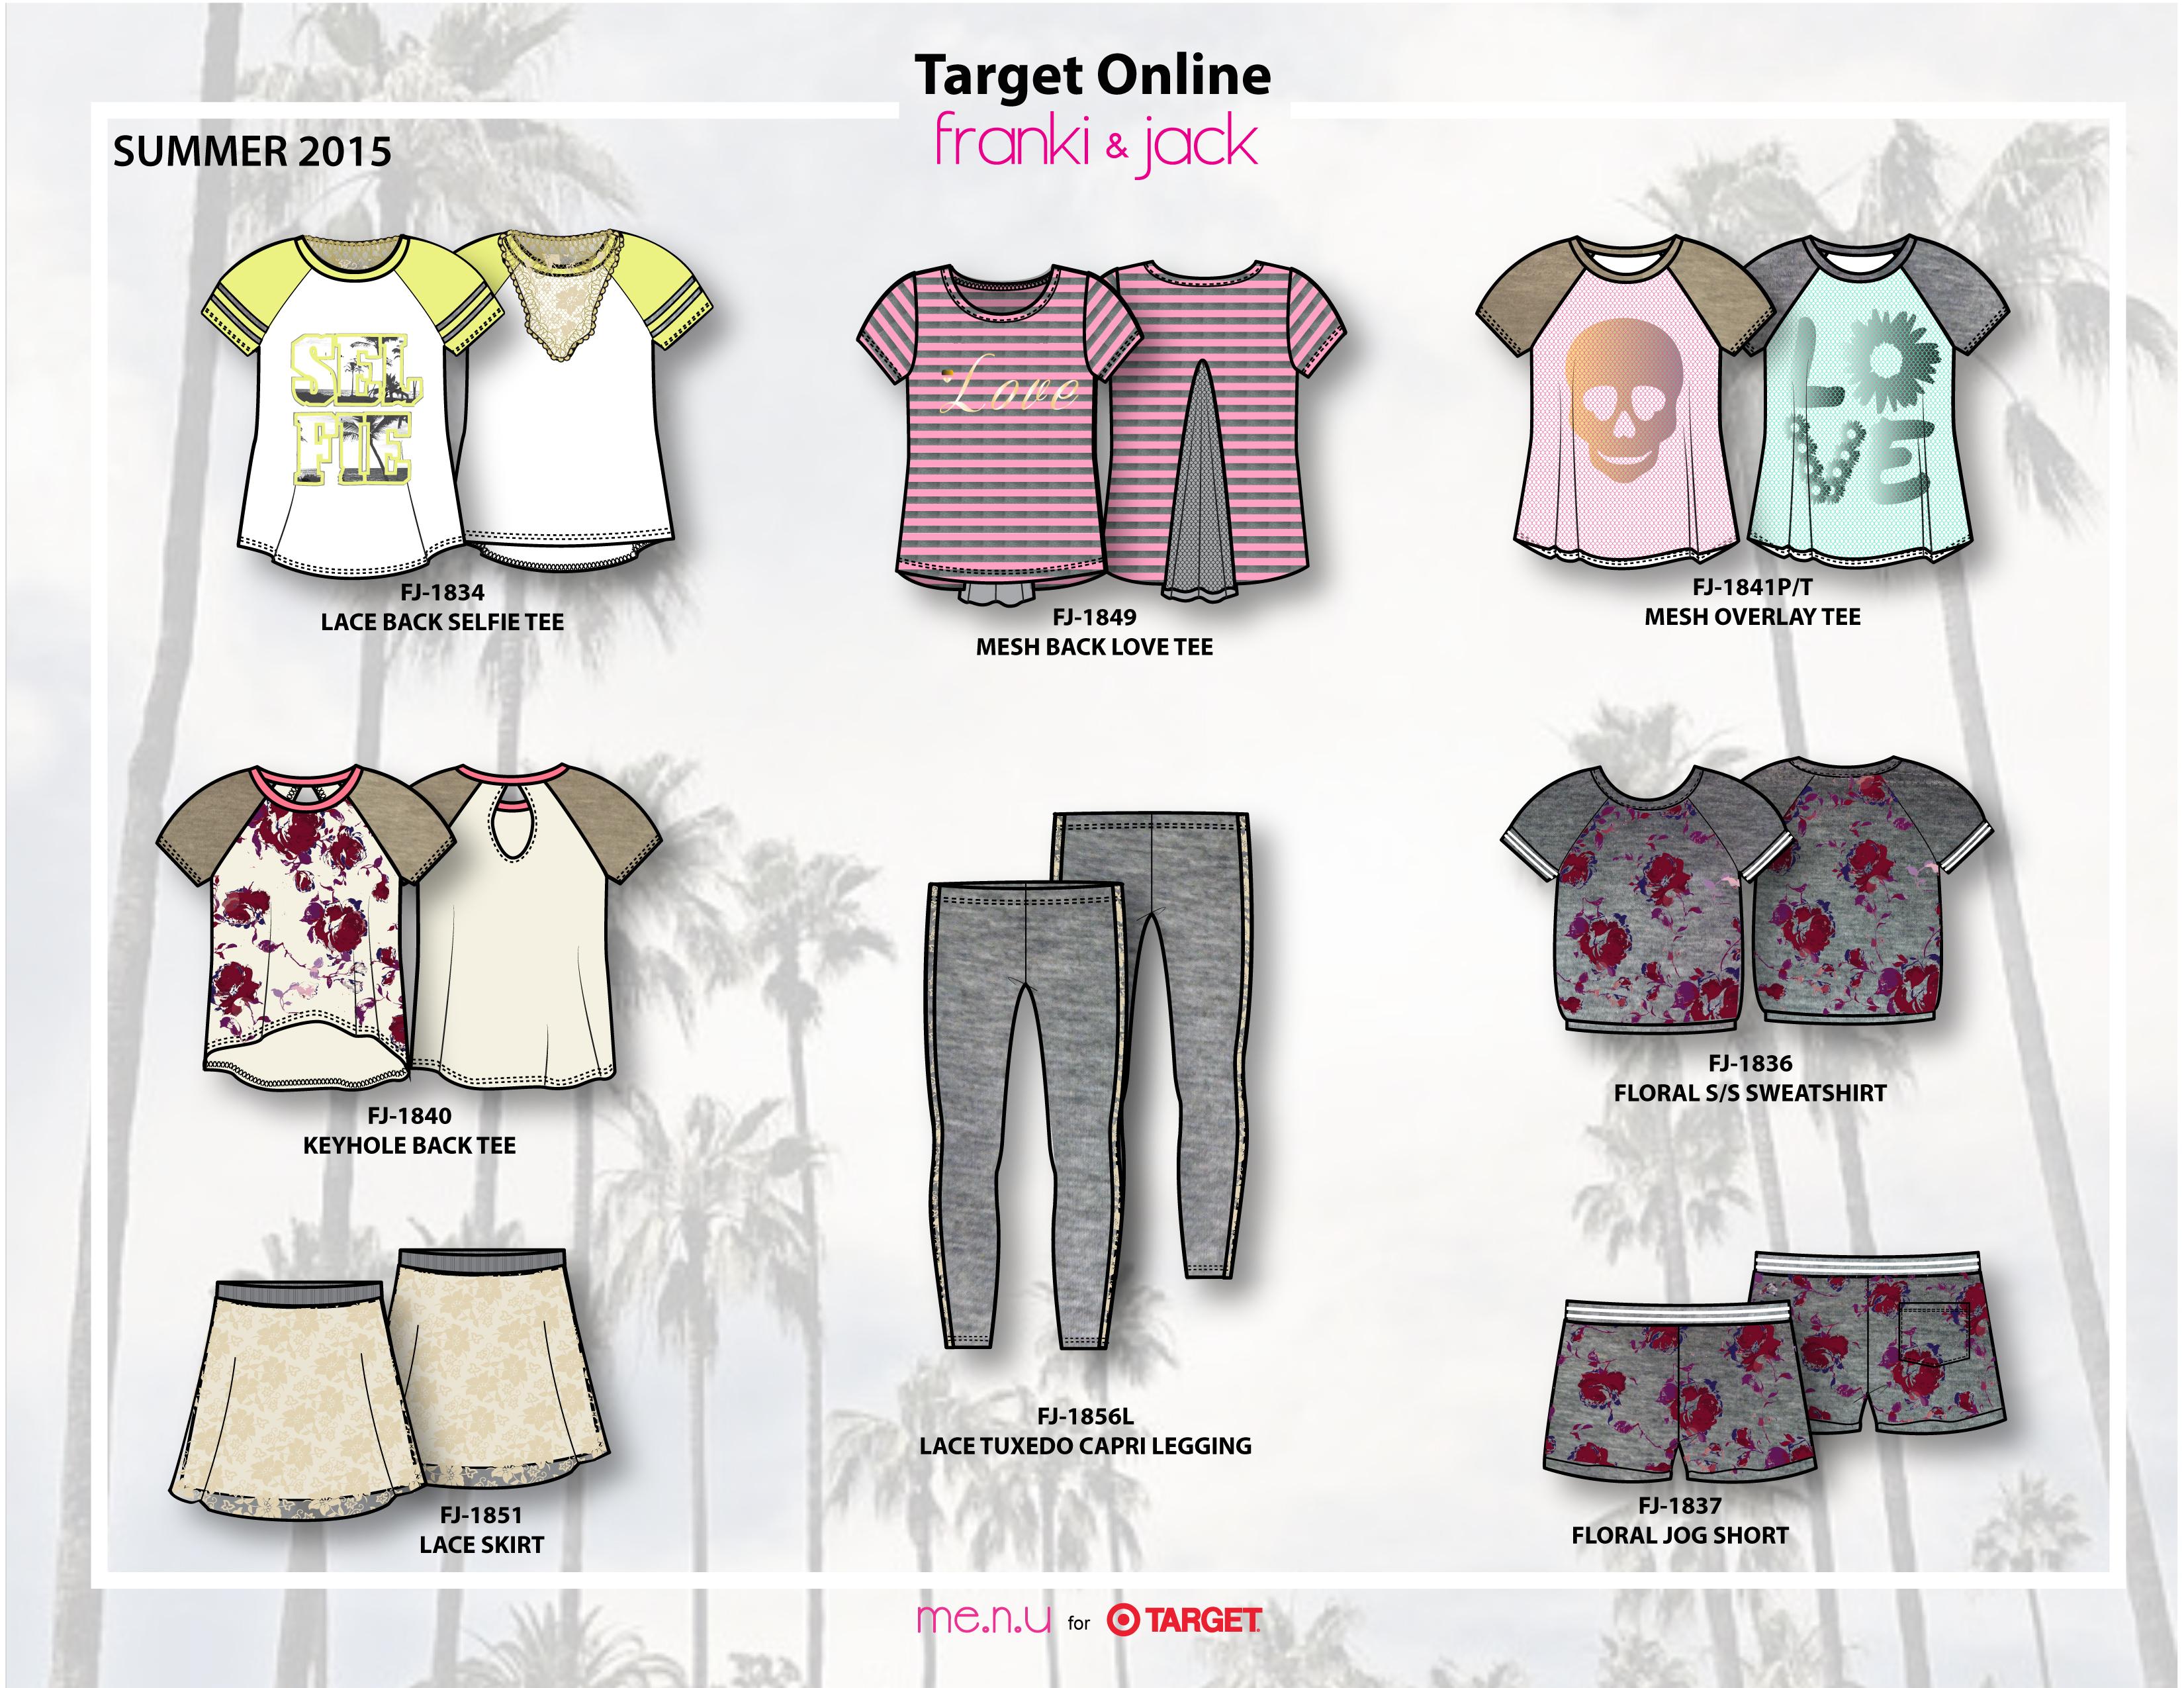 Me.n.u for Target Online Spring 2015